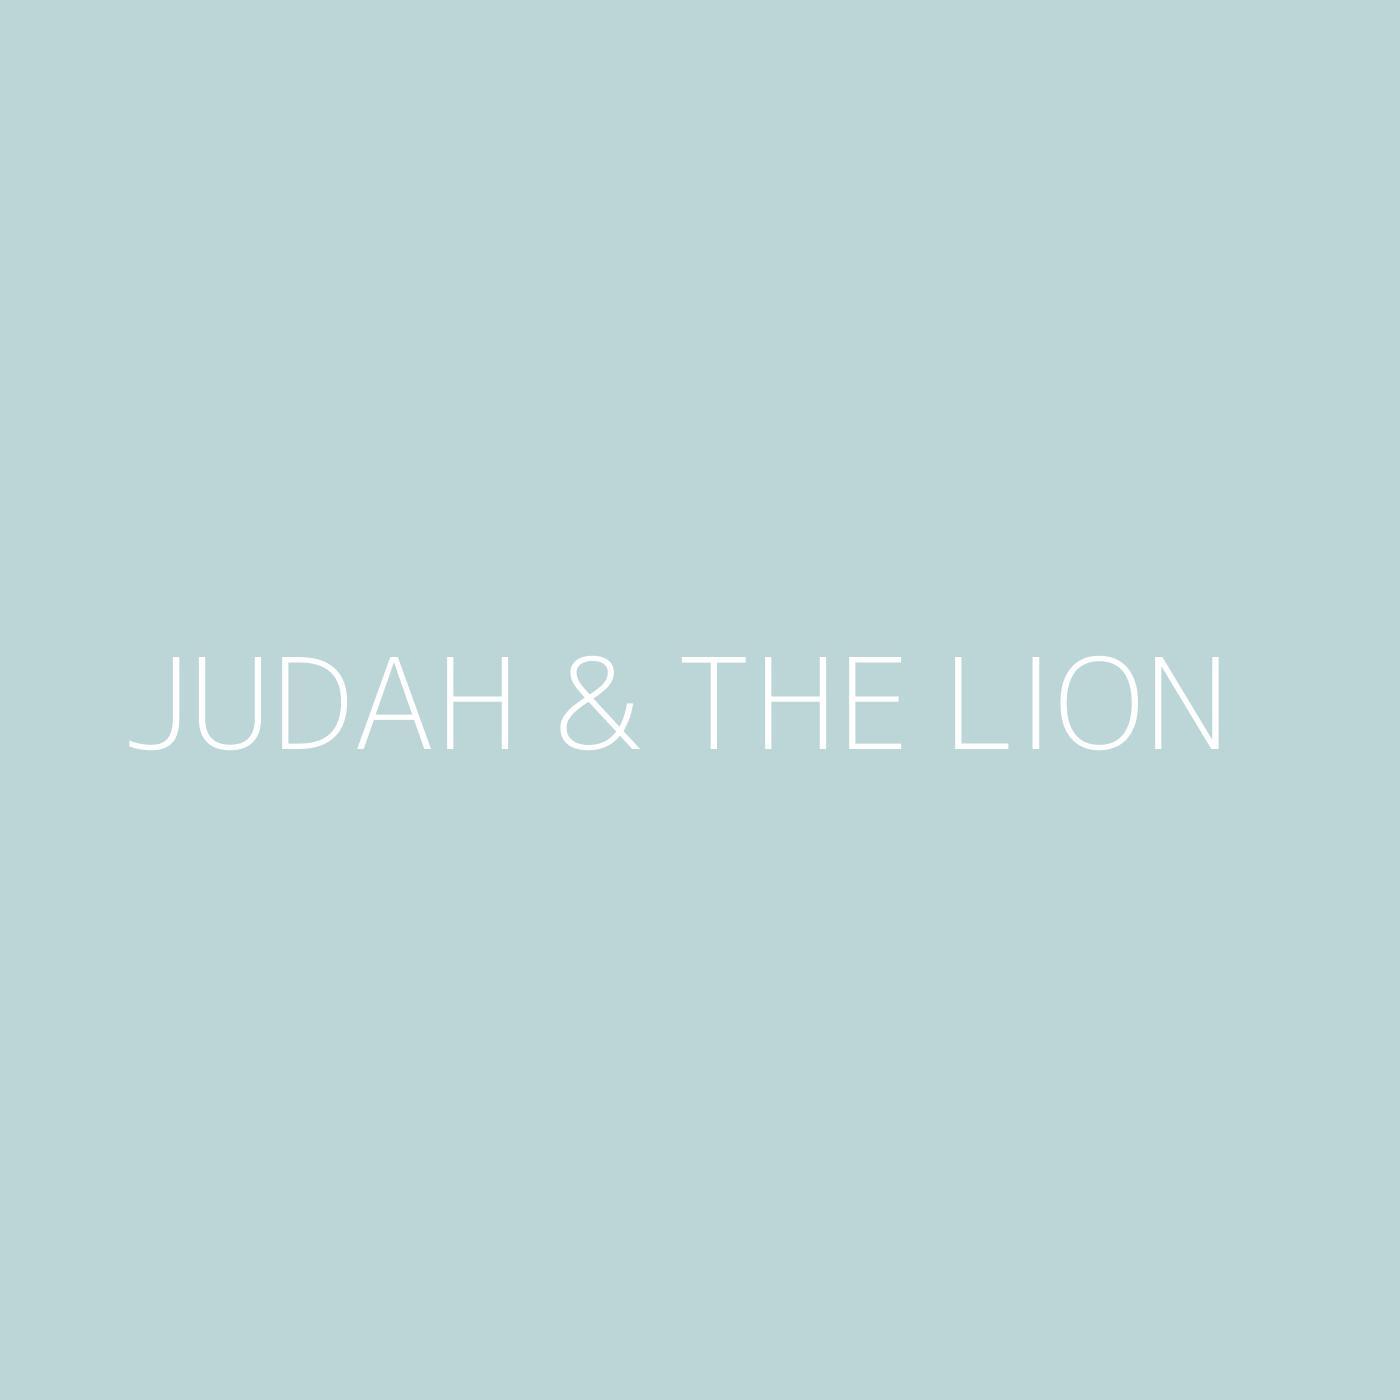 Judah & the Lion Playlist Artwork